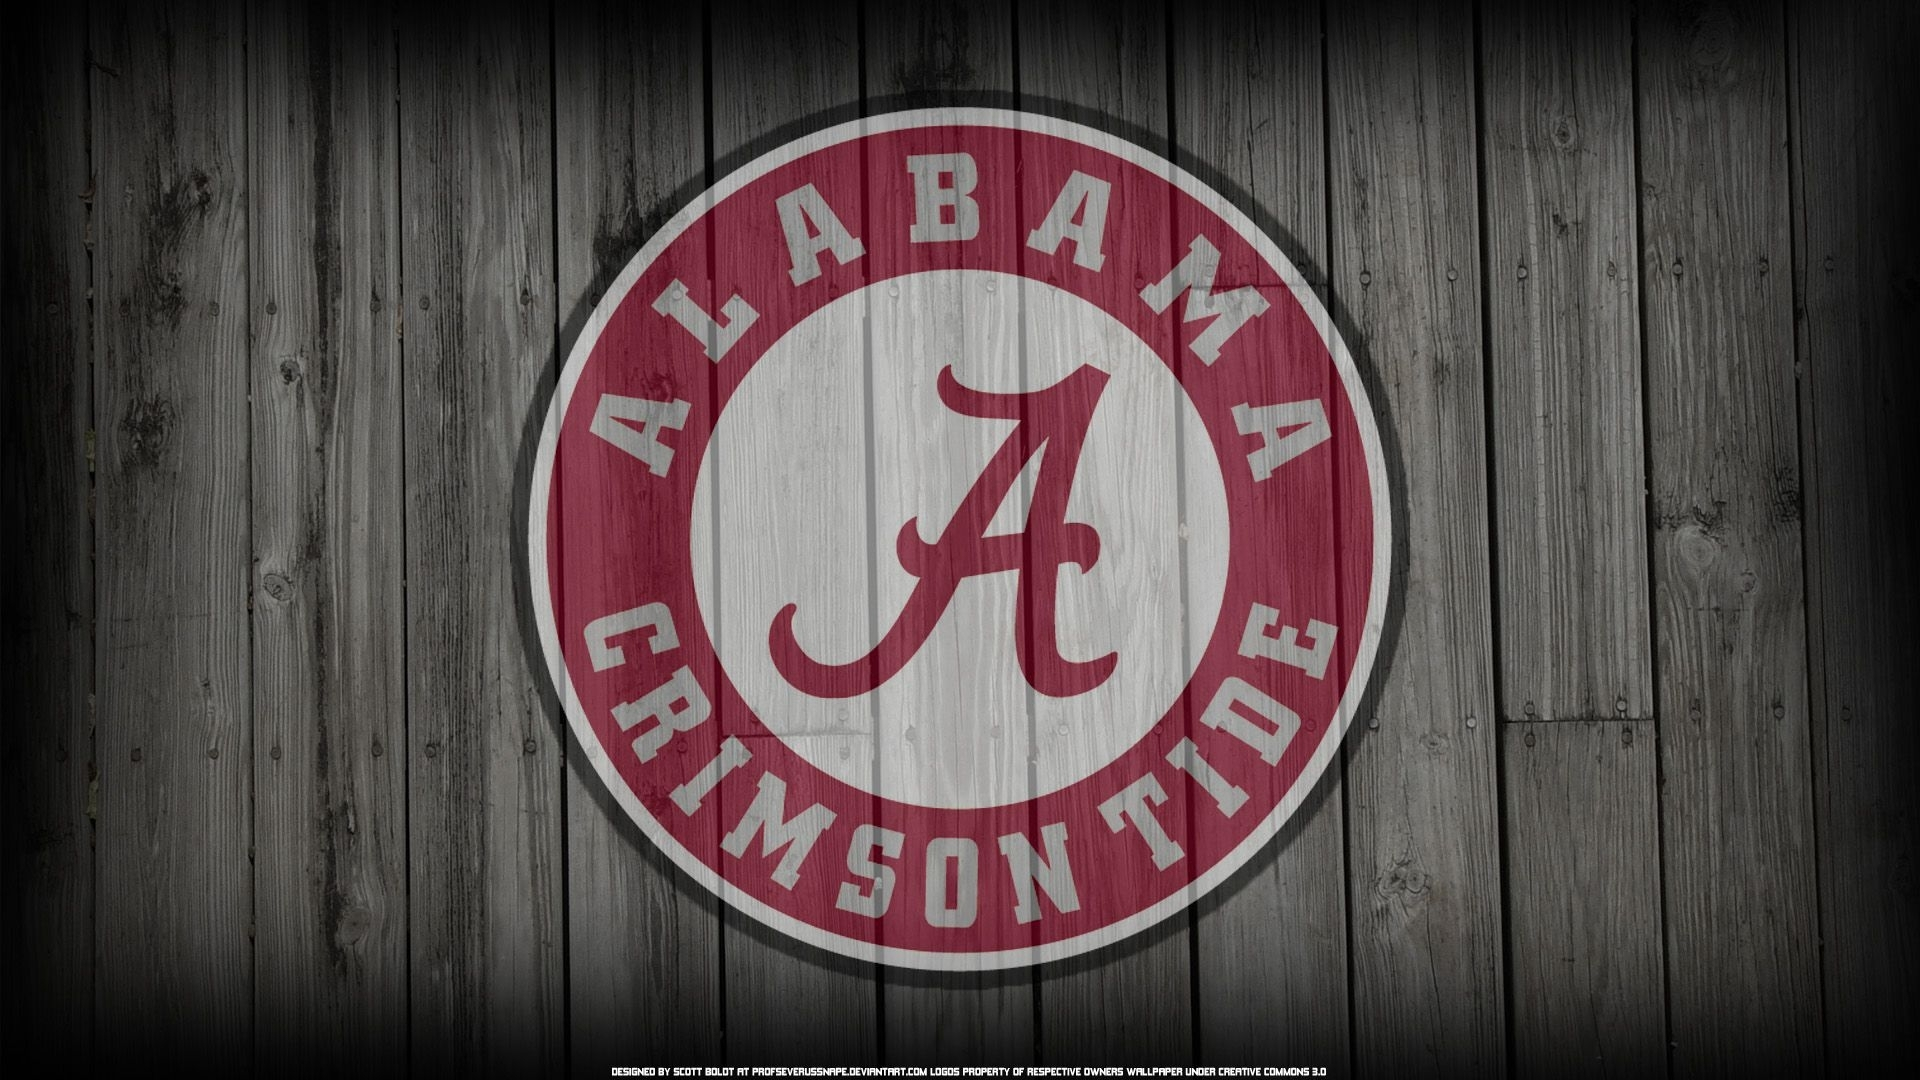 alabama crimson tide logo on wood background (by ~profseverussnape